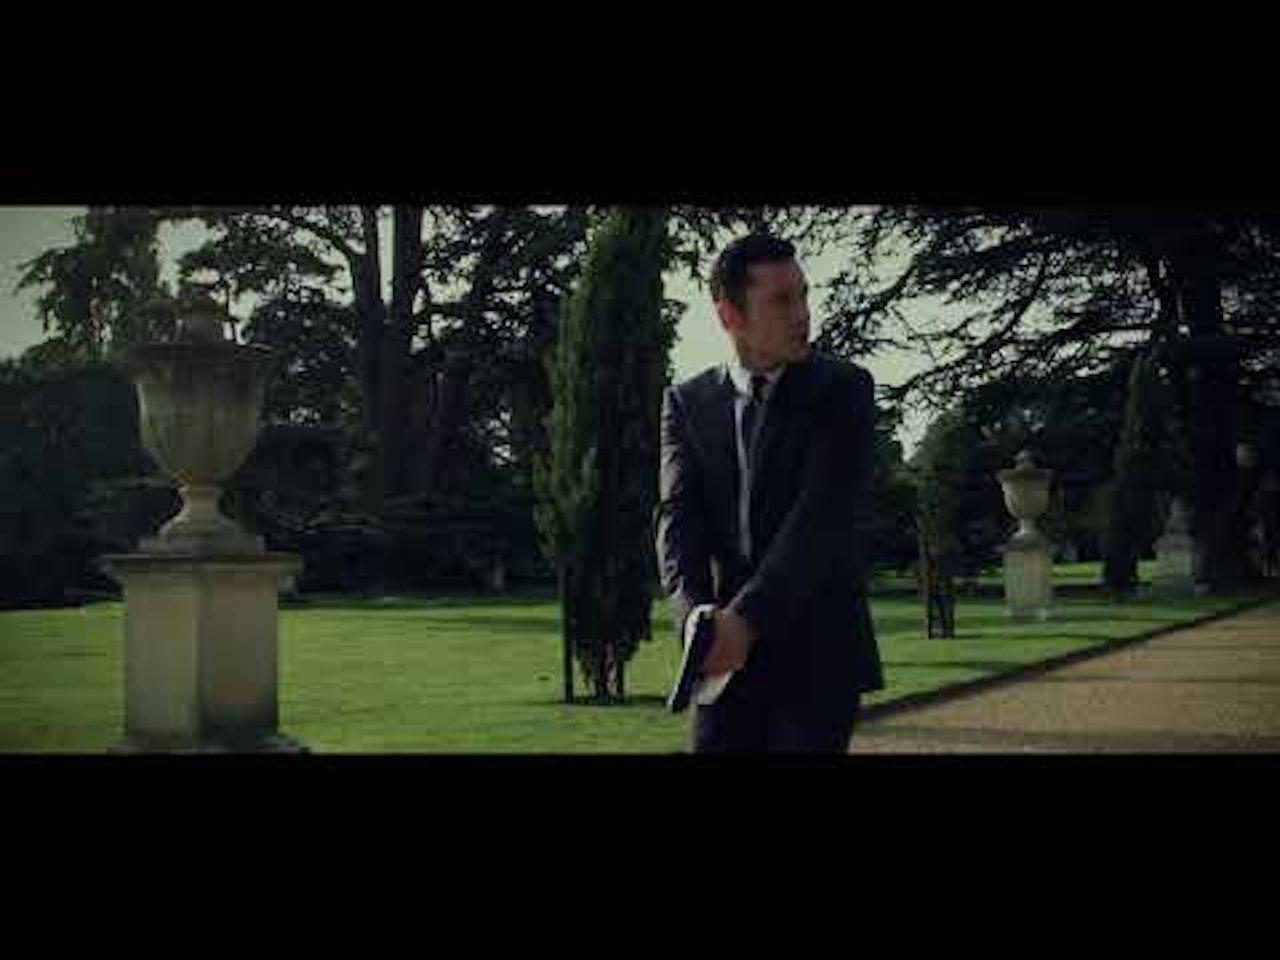 63 Steps - A Micro-Short Film